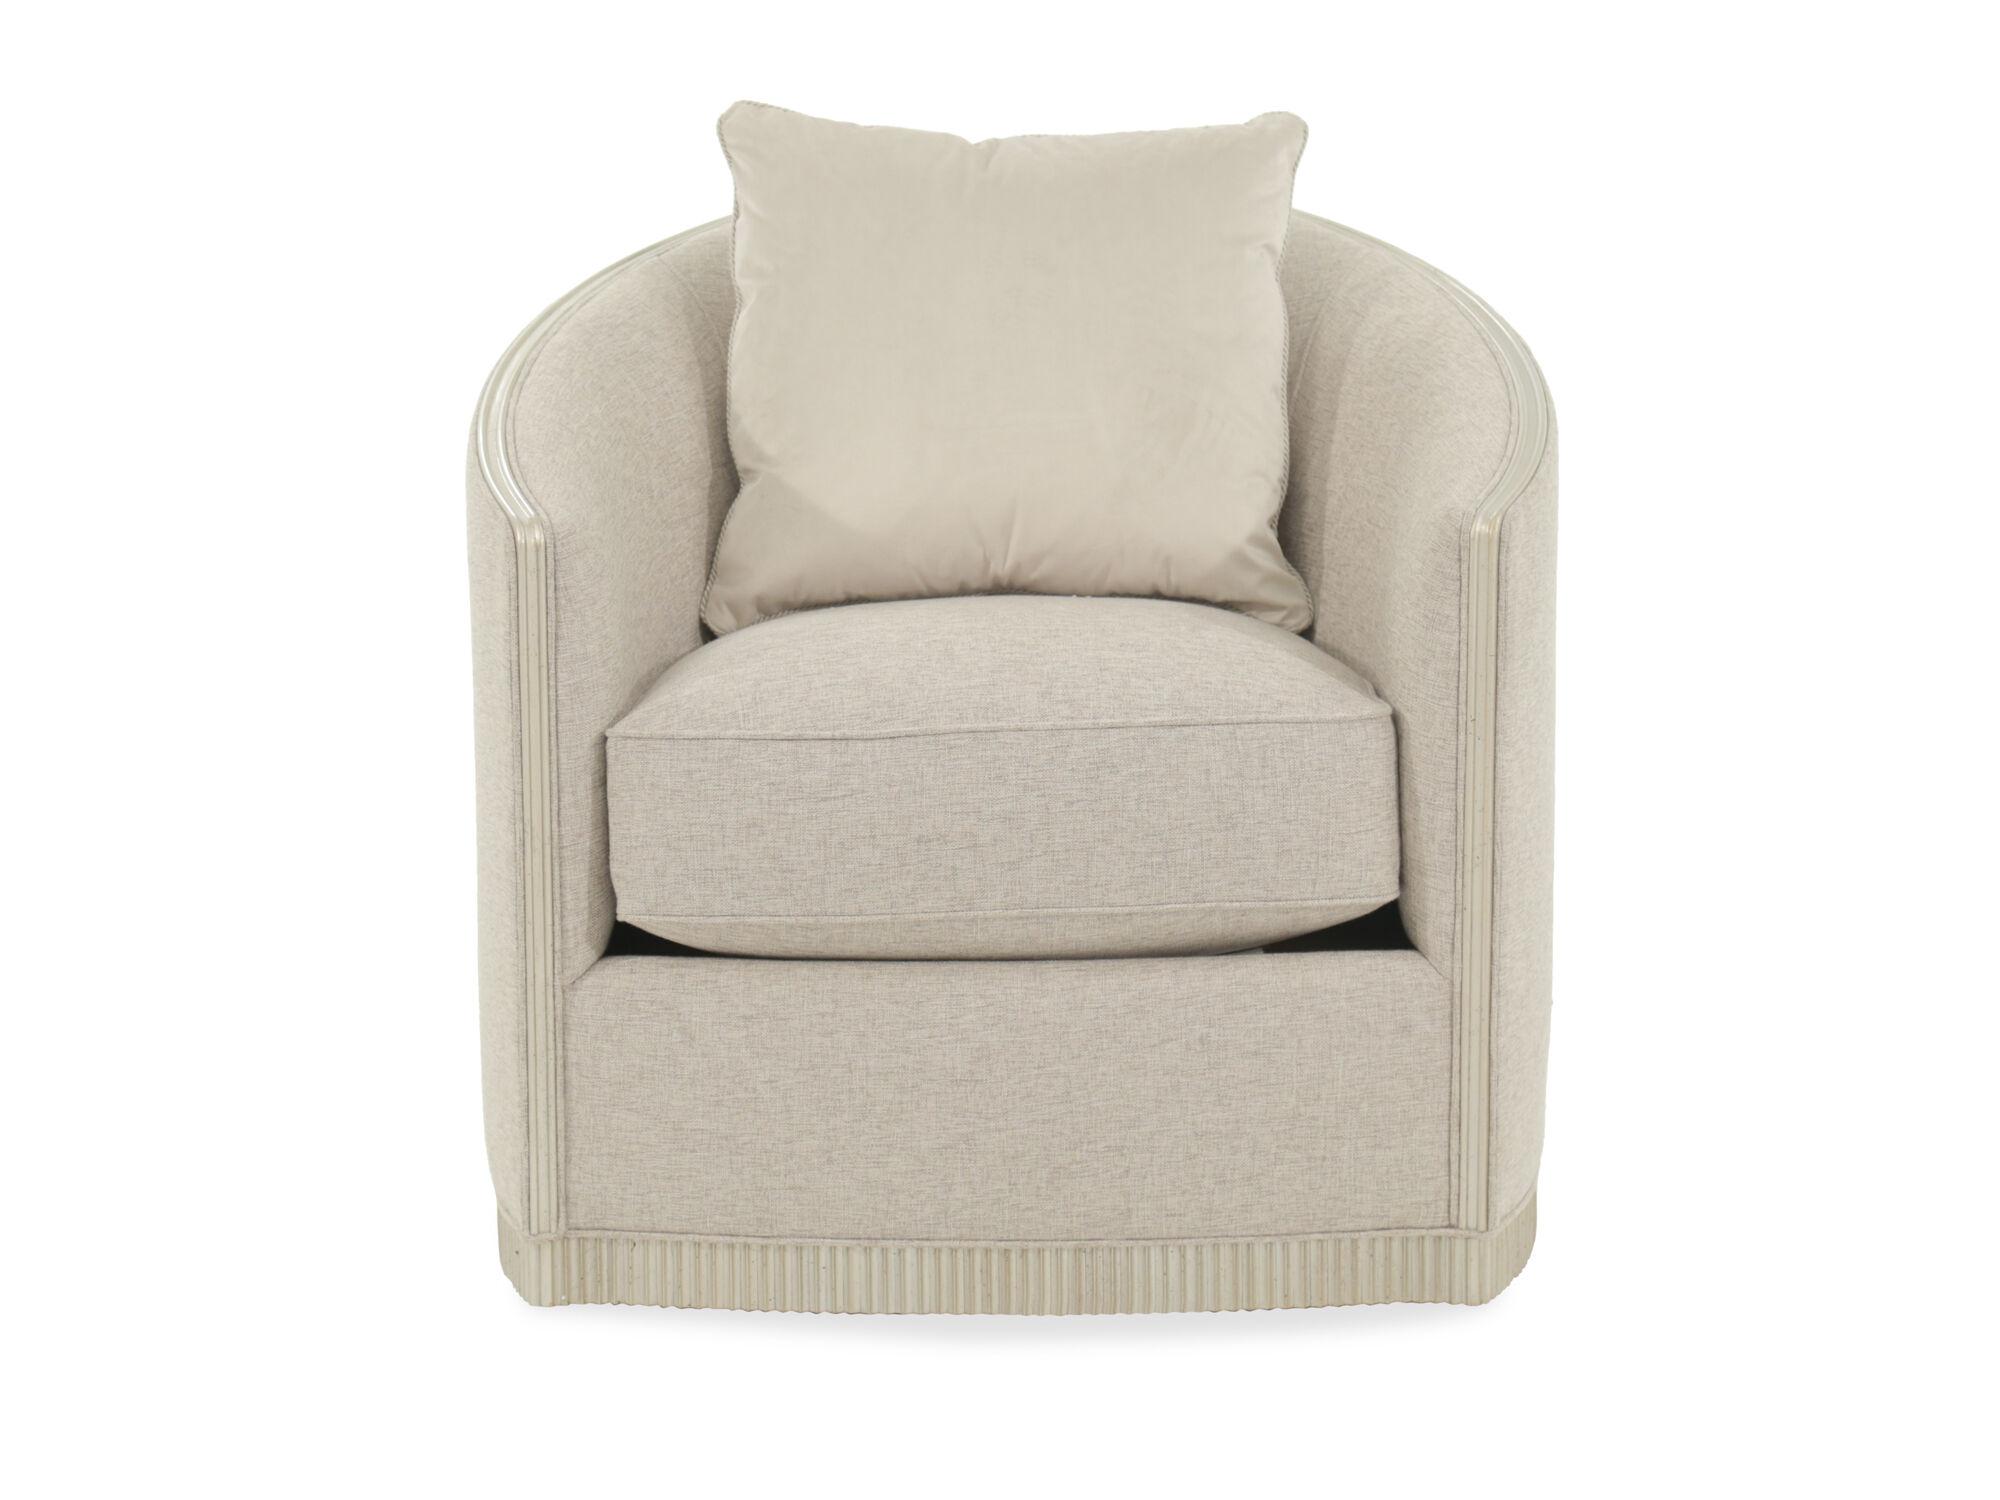 Images Exposed Rail Contemporary 31.5u0026quot; Swivel Chair In Cream Exposed  Rail Contemporary 31.5u0026quot; Swivel Chair In Cream